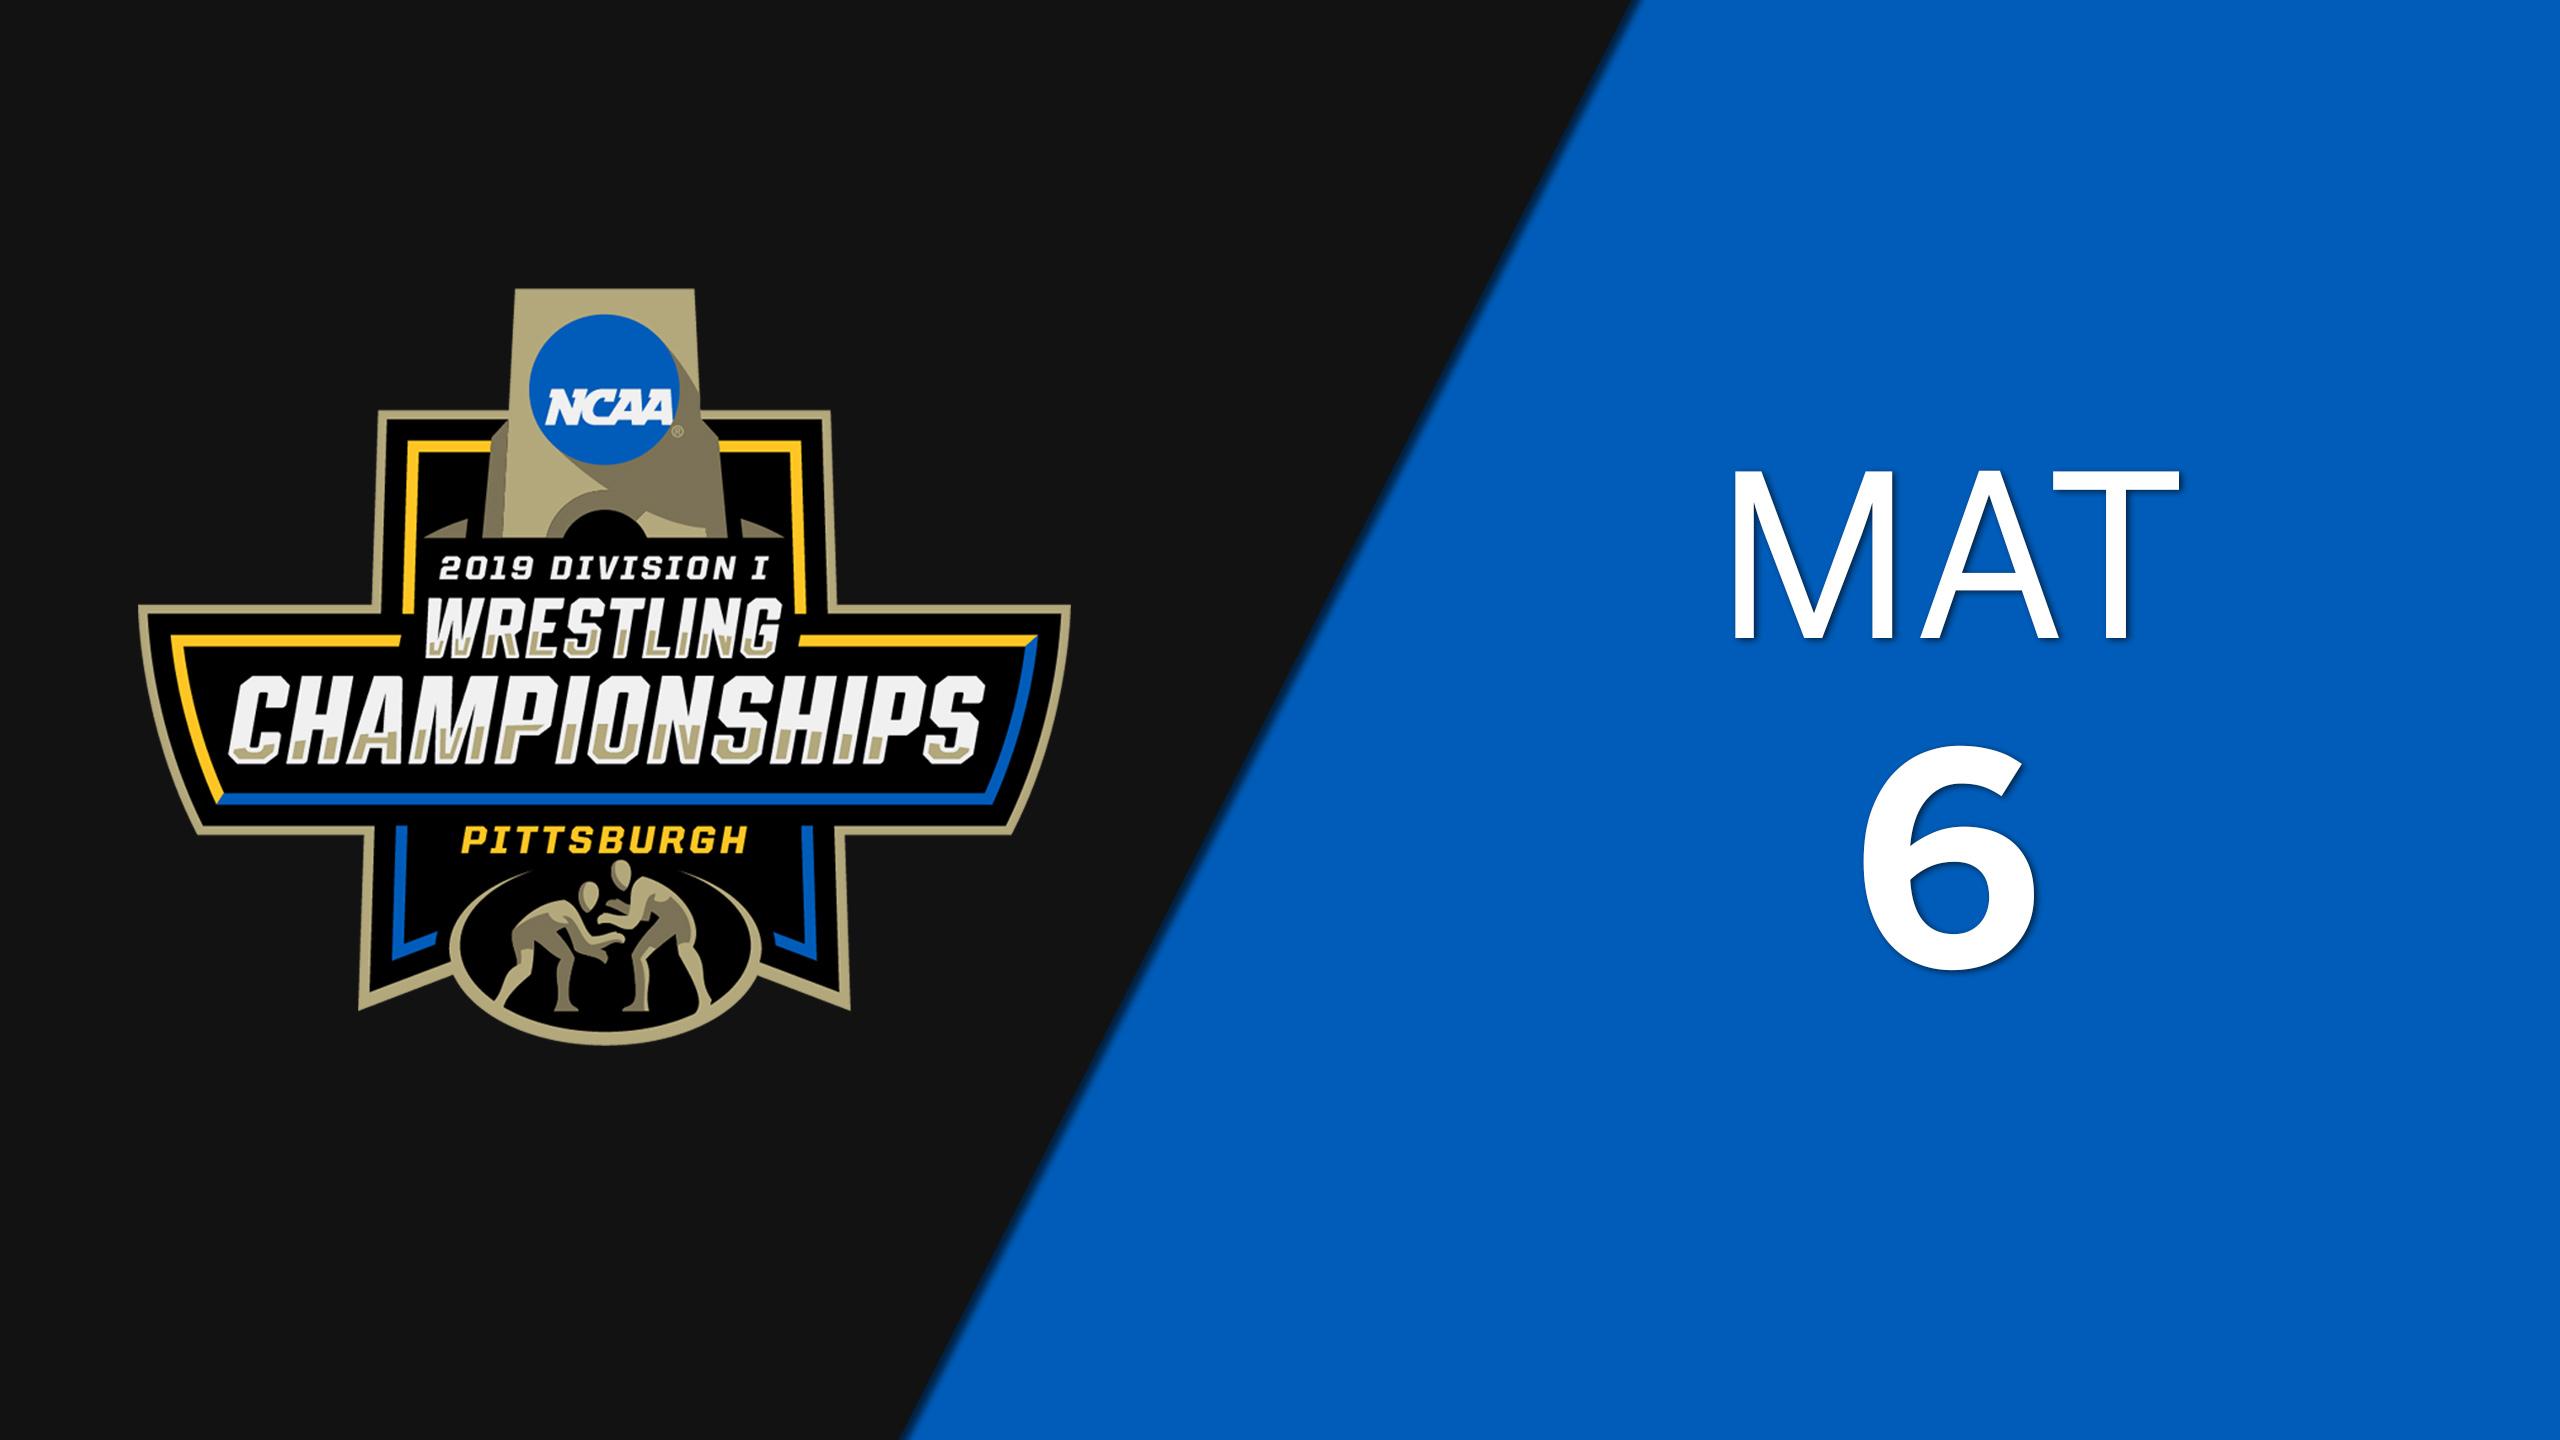 NCAA Wrestling Championship (Mat 6, Second Round)